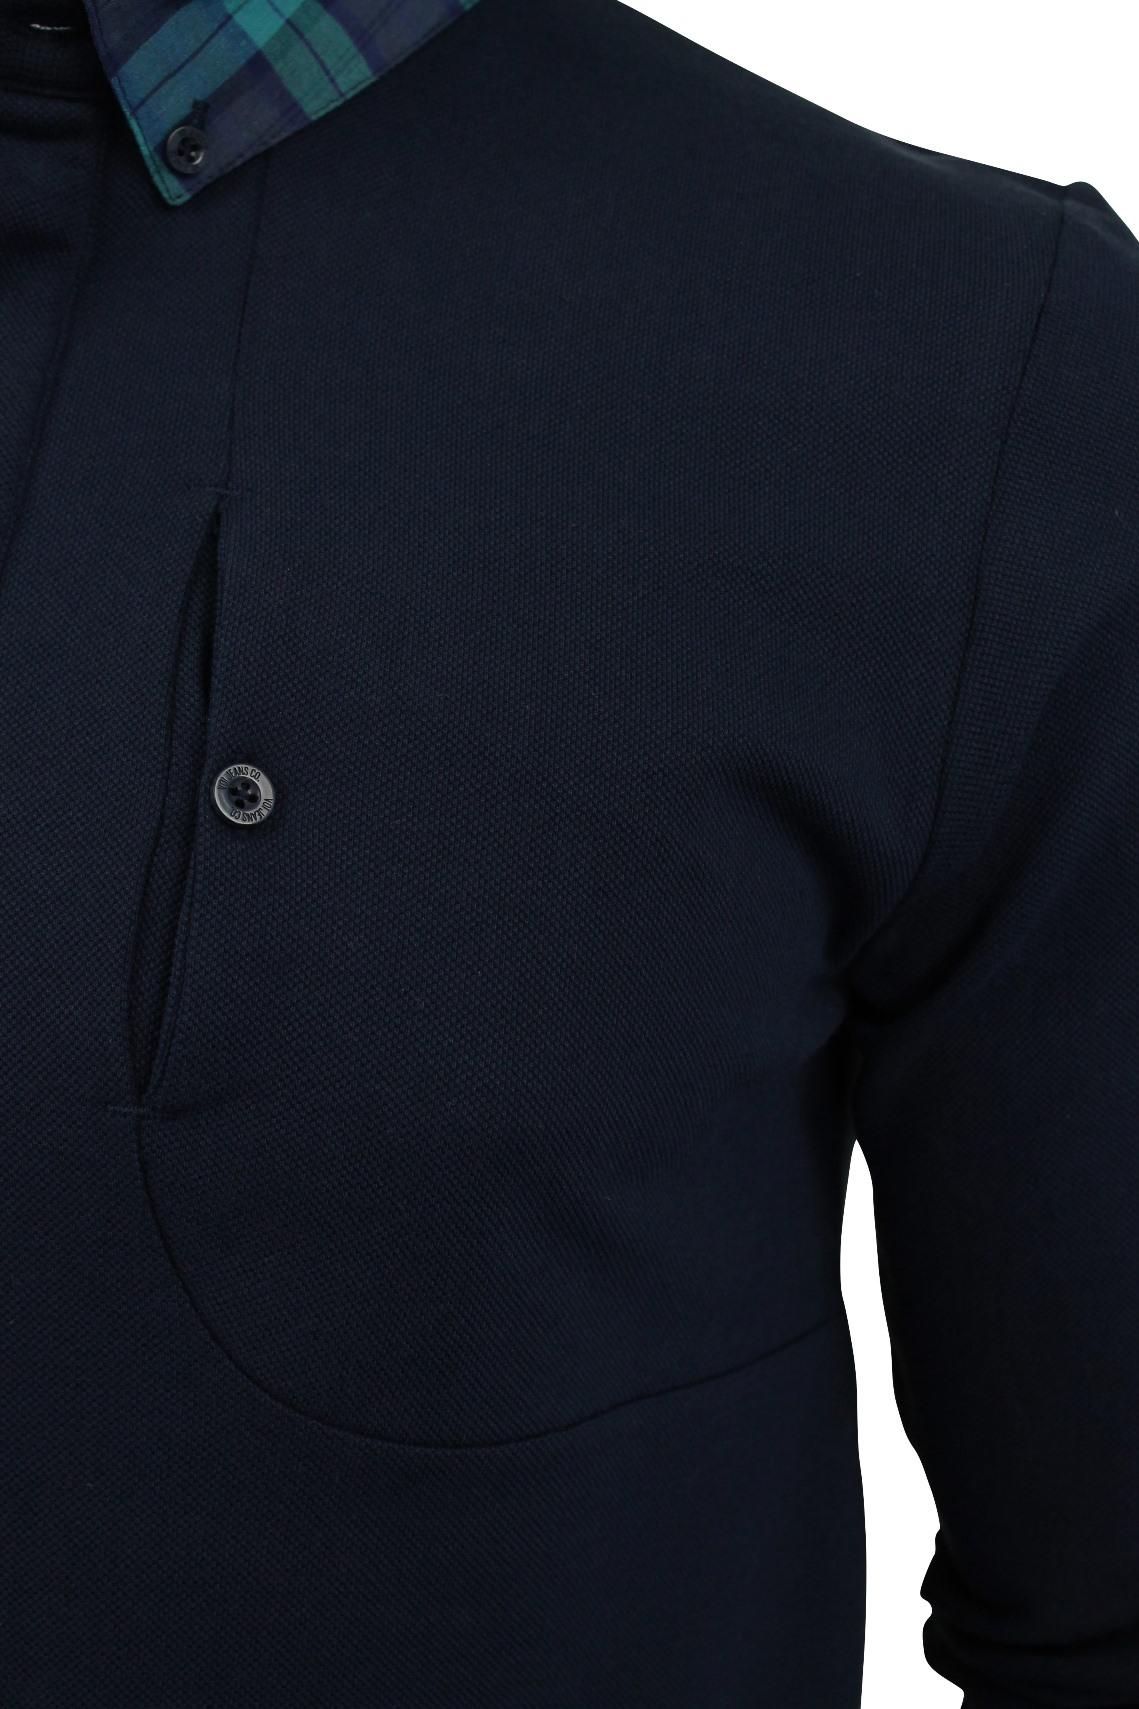 Camisa-Polo-para-hombre-por-Voi-Jeans-039-Rory-039-Manga-Larga miniatura 4